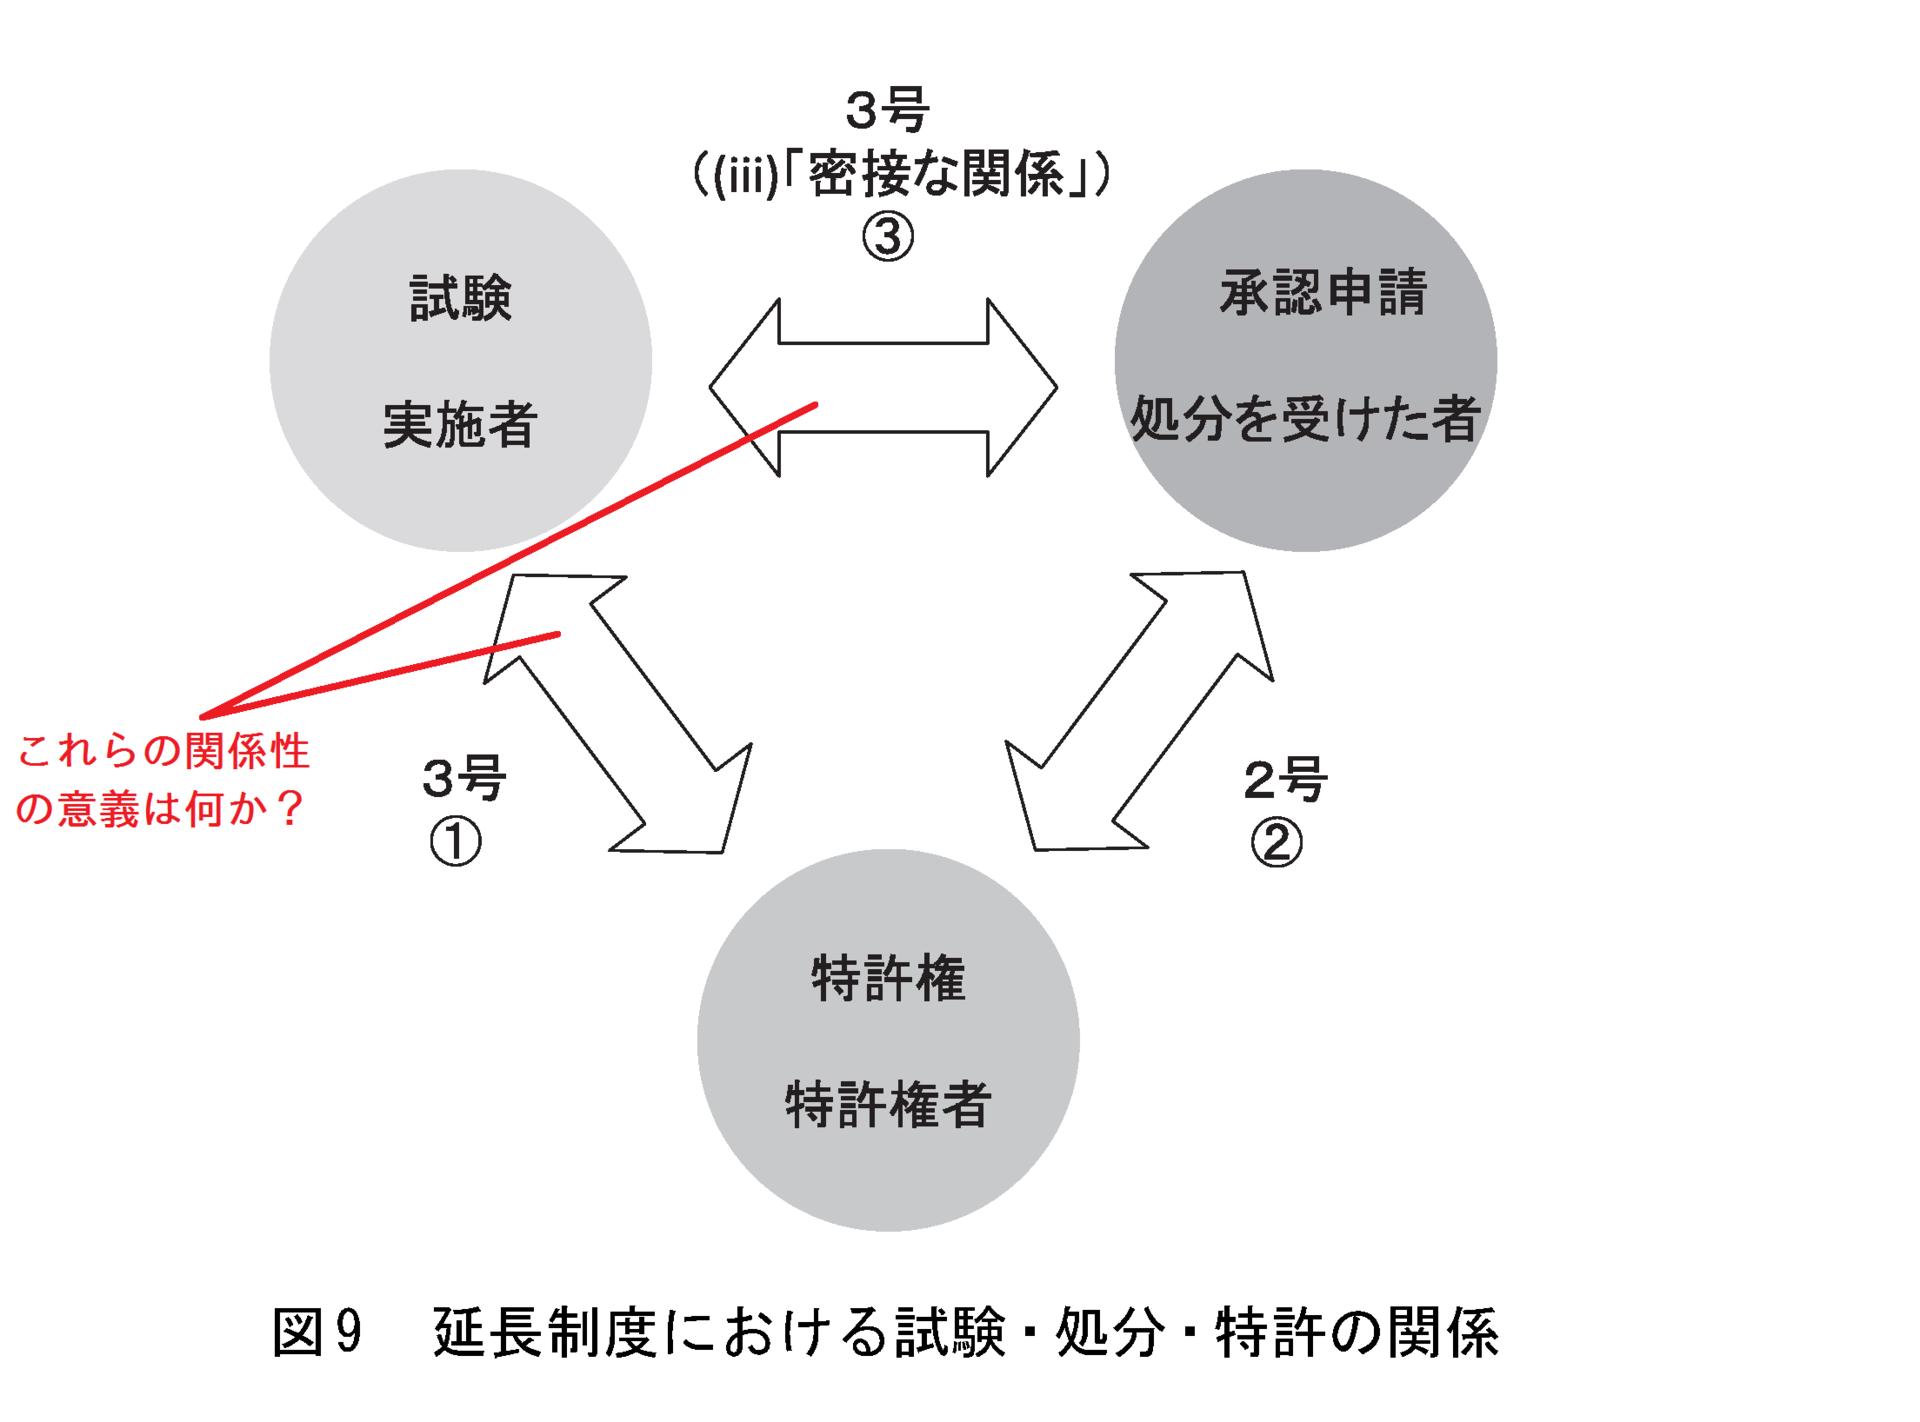 2020shimizu_fig09kai.png